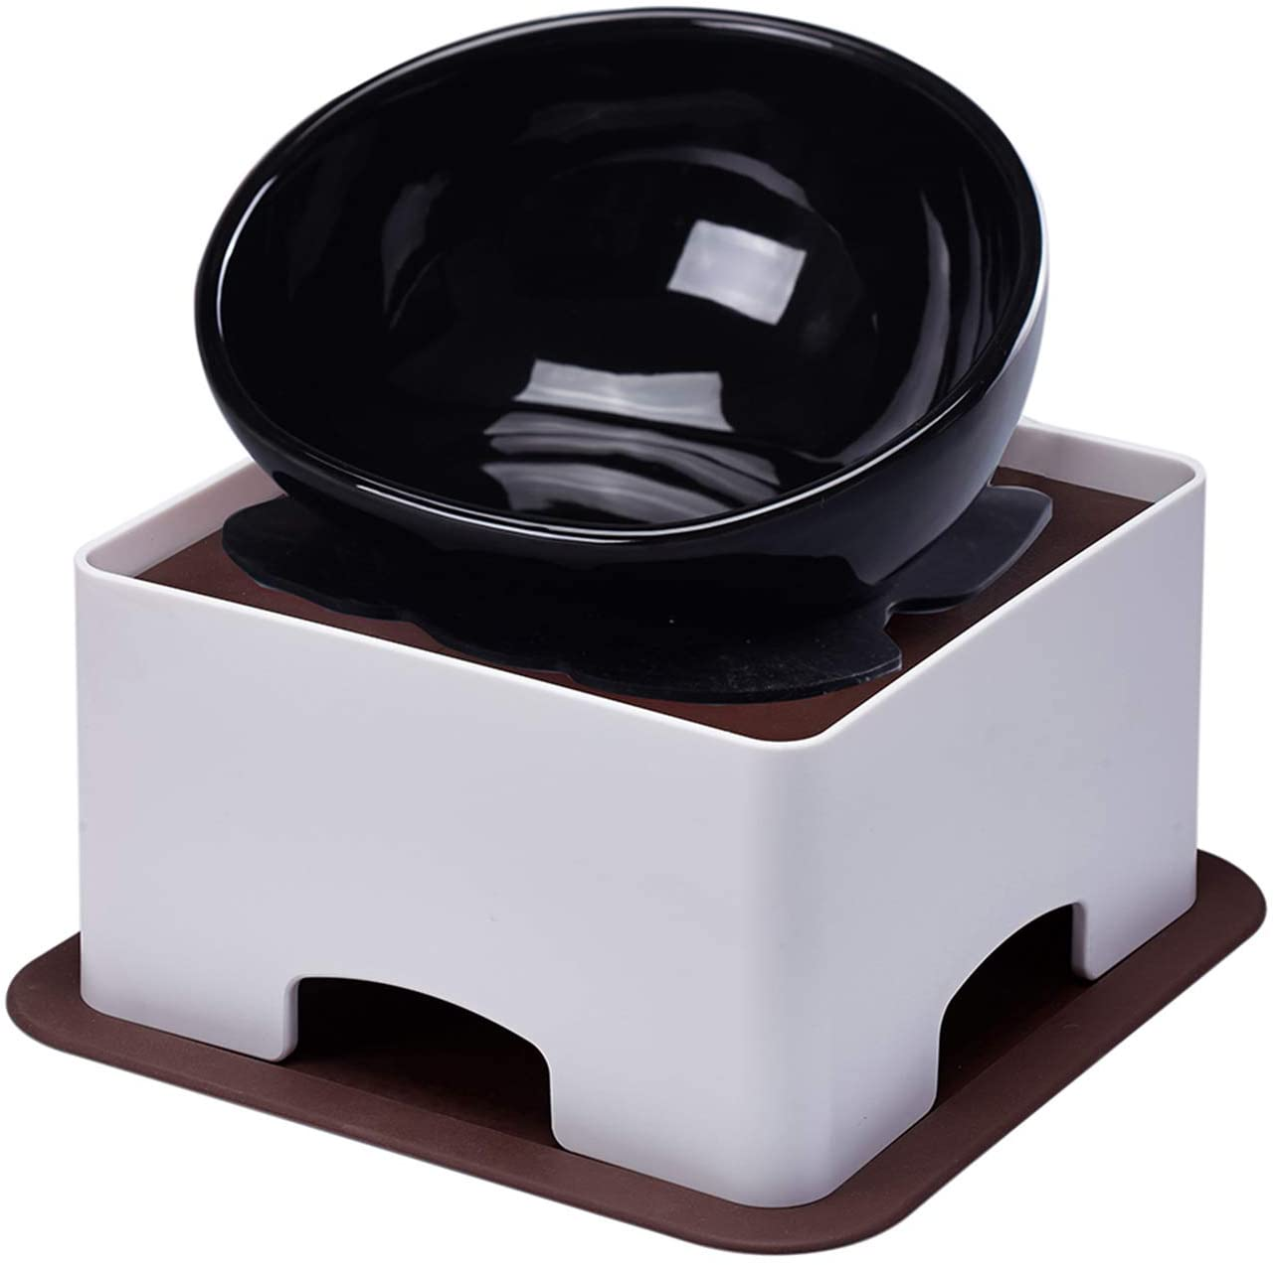 YMAXGO French Bulldog Food Bowl Set,English Bulldog Cub Food Plate + Height Adjustable Bracket (Black)